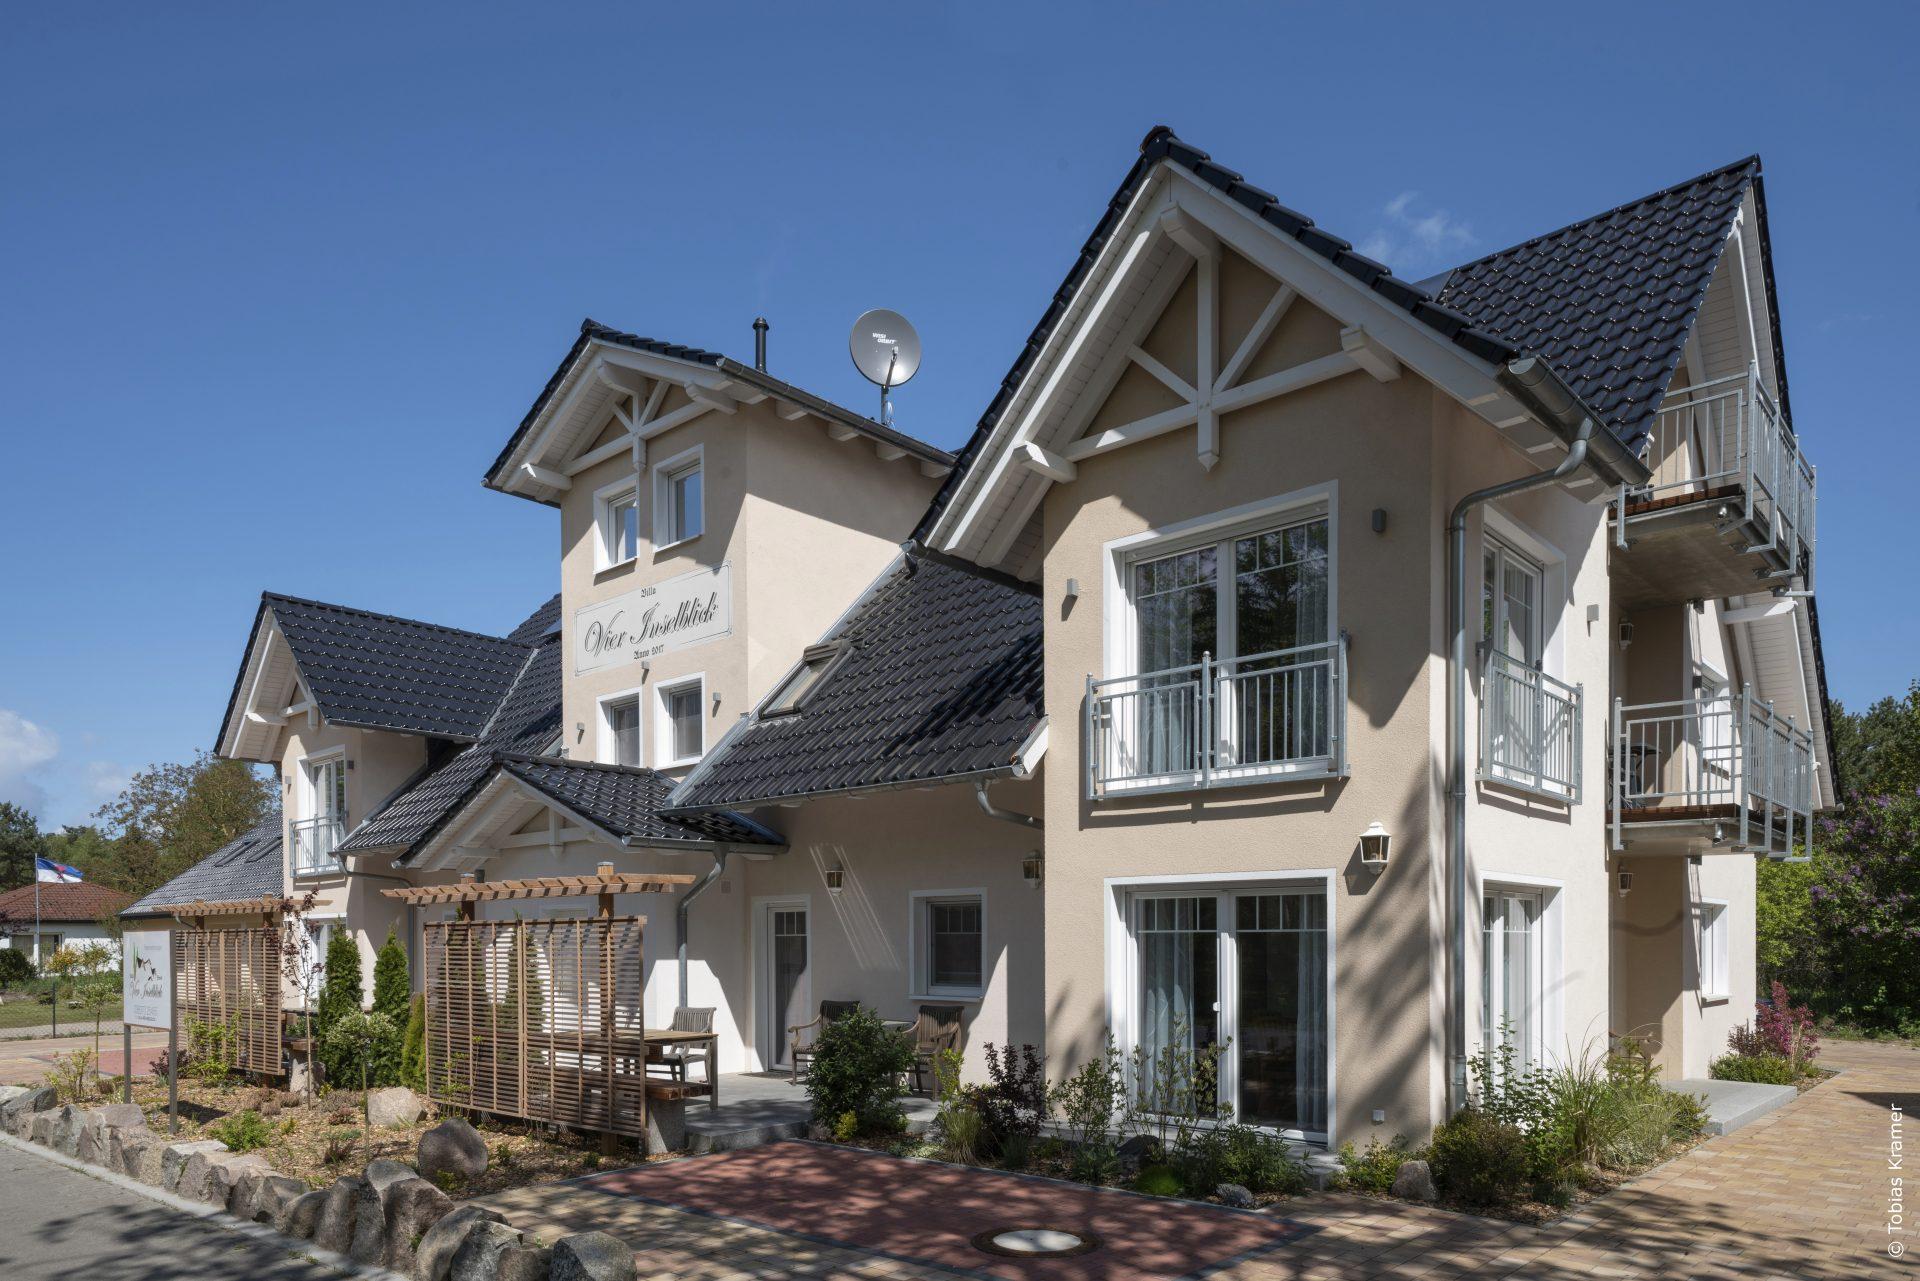 Villa Vier Inselblick in Freest